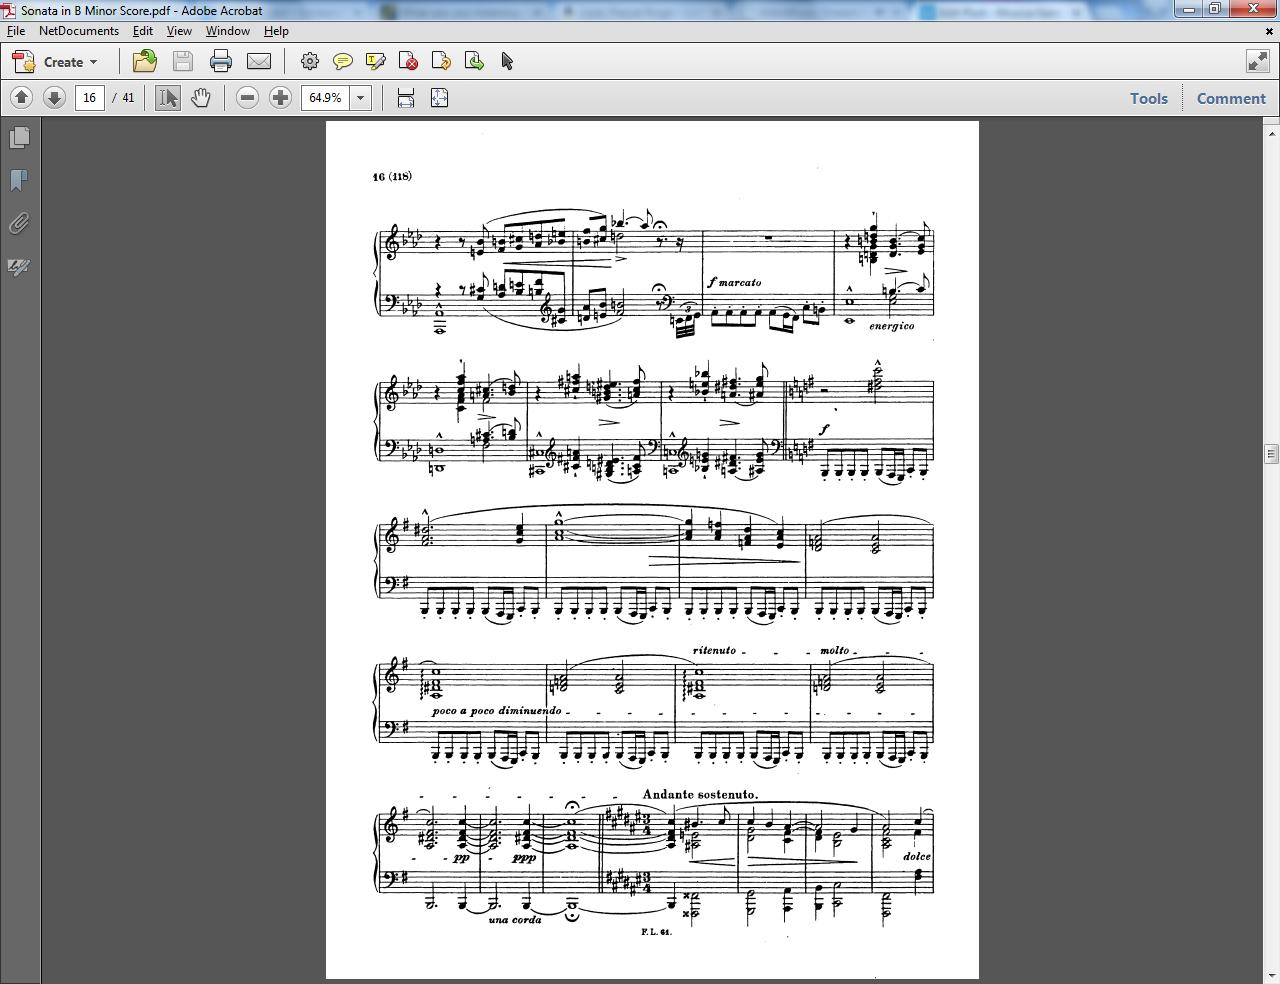 an analysis of liszt sonata Franz schubert (germany, 1797): sonata in a major, d959 ferencz liszt: sonata in b minor  violin sonatas johannes brahms: violin sonata in a major op100.